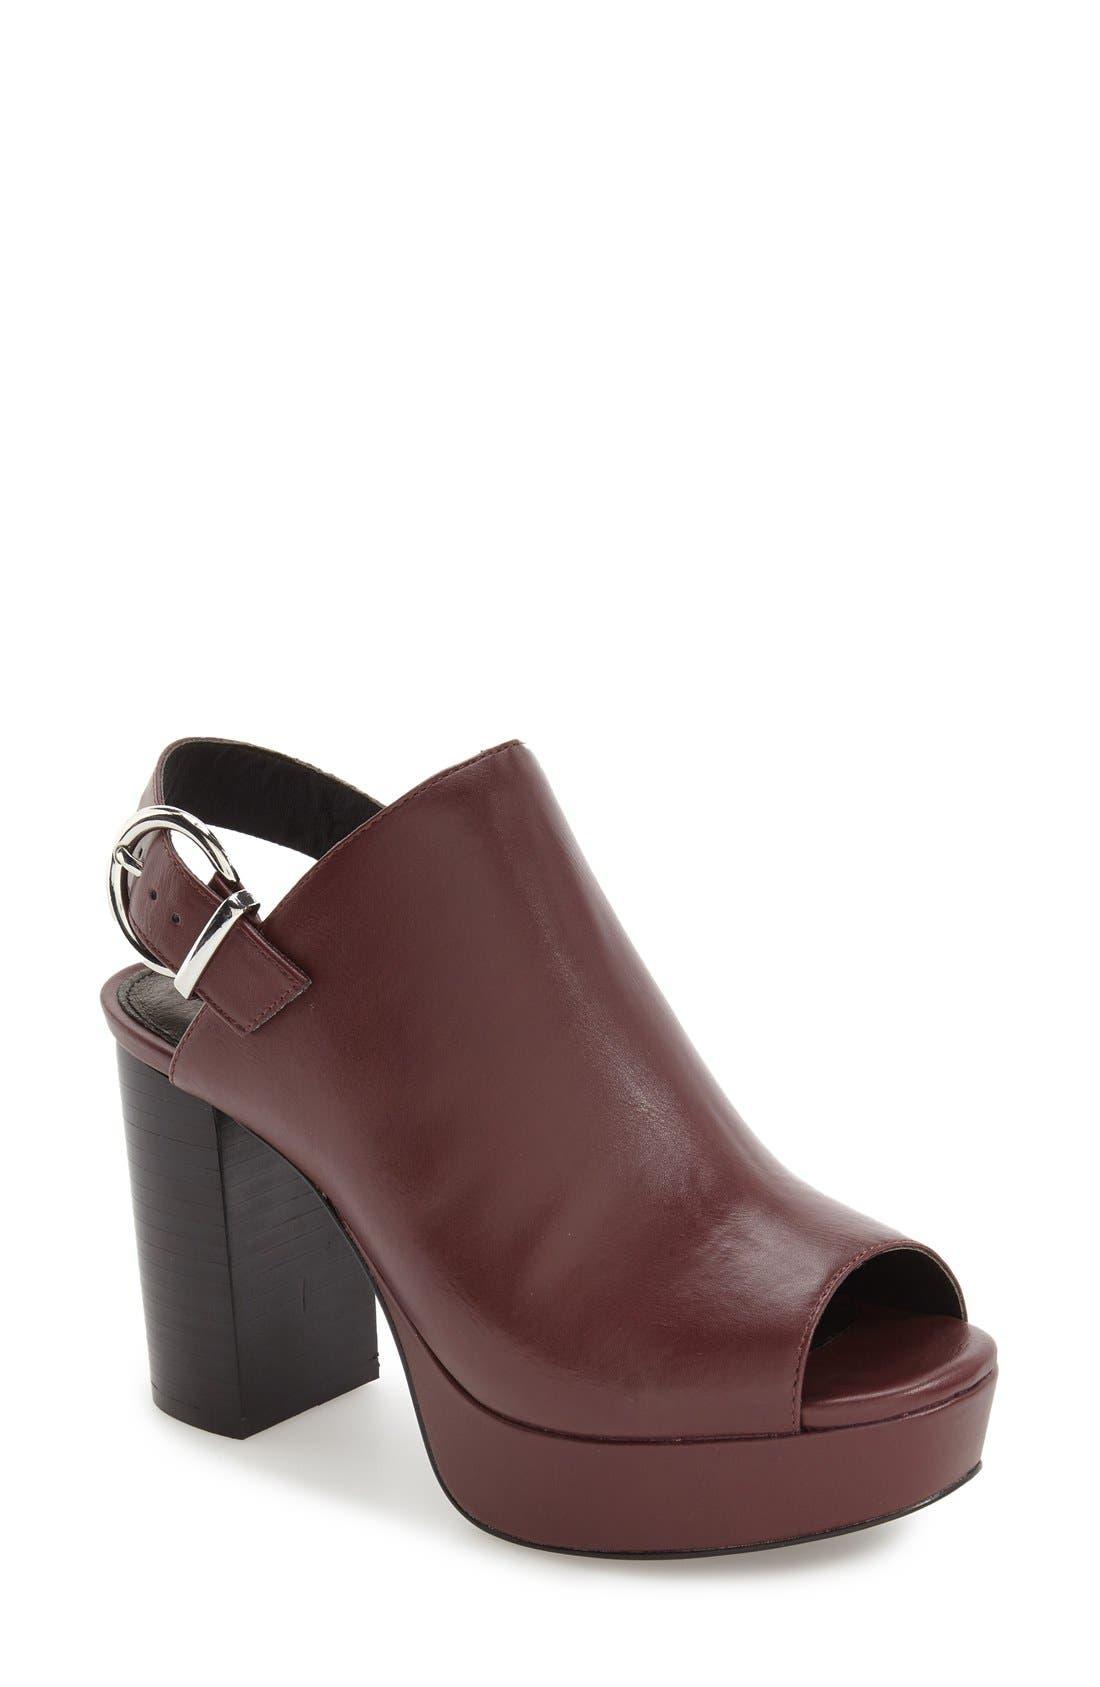 Main Image - Topshop 'Liquorice' Platform Sandal (Women)